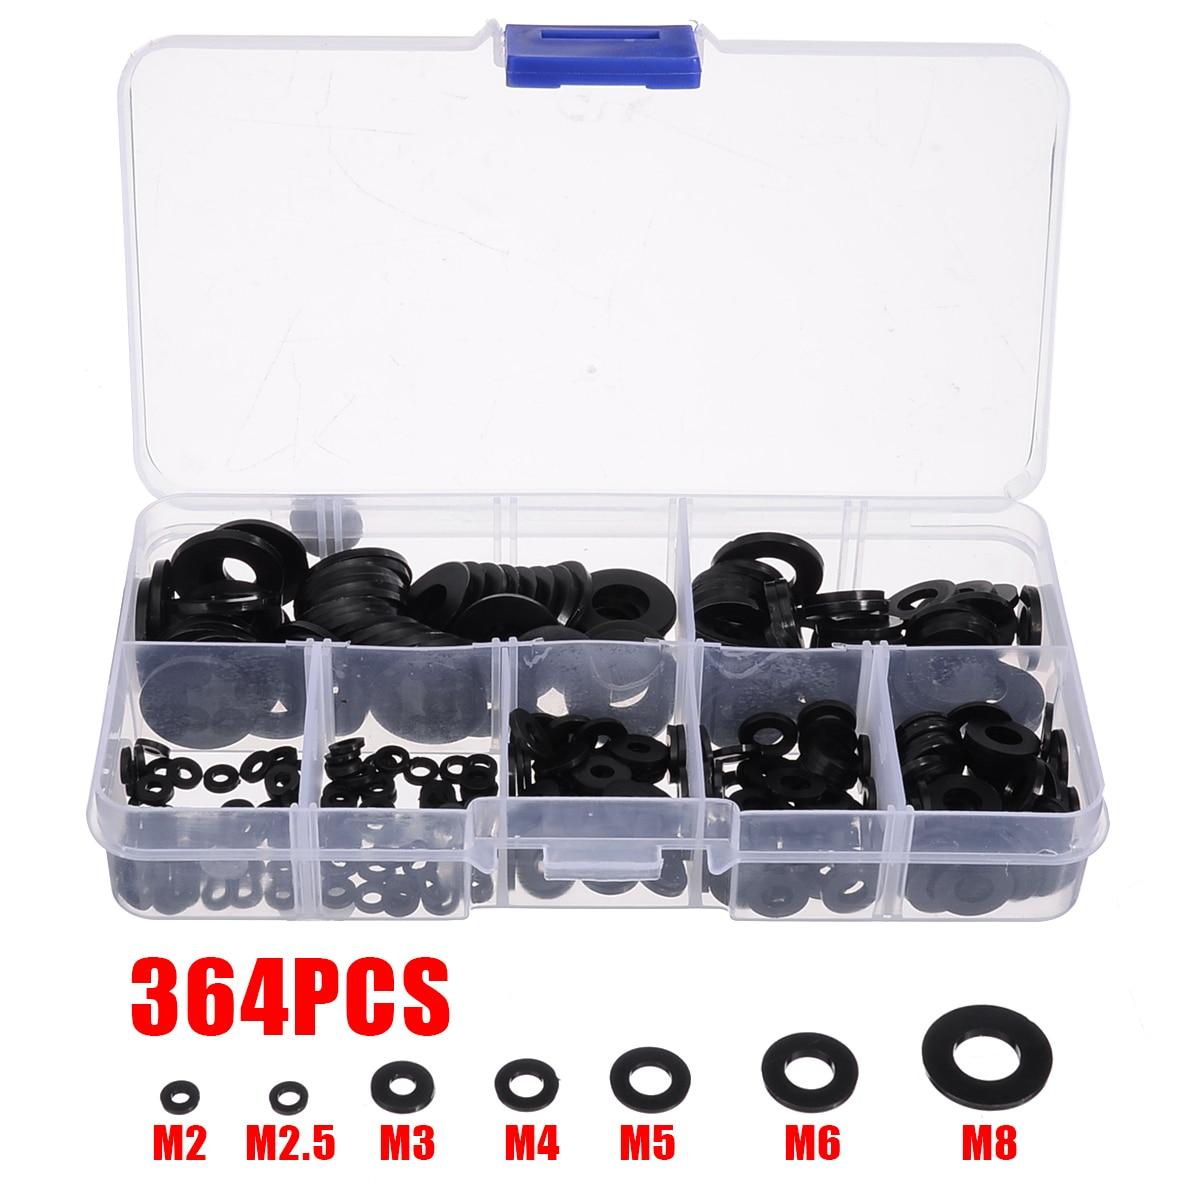 Set Of 364Pcs Black Nylon Flat Ring Plain Repair Washer Gasket For Metric M2-M8